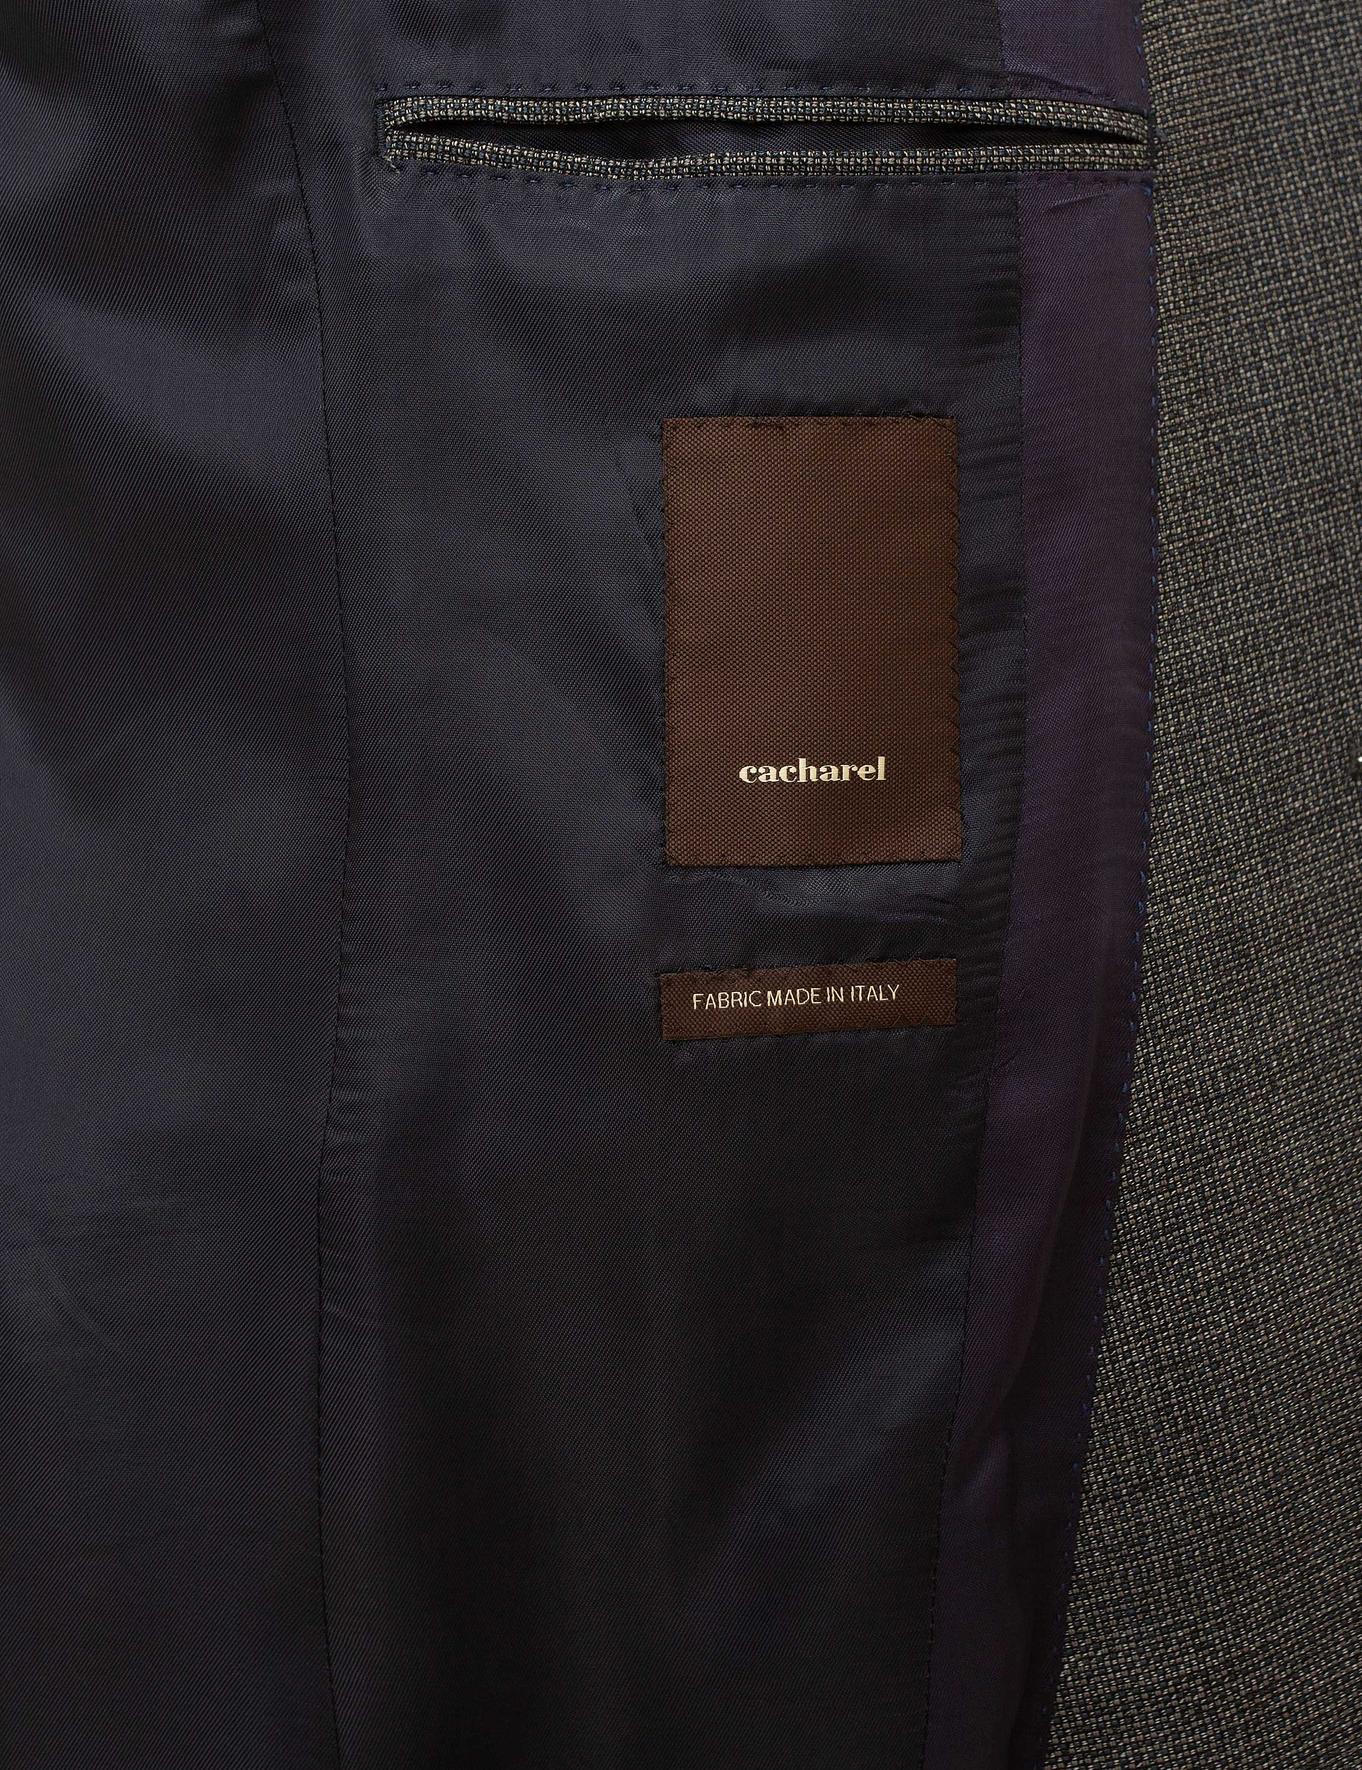 Mavi Slim Fit Takım Elbise - 50206932038